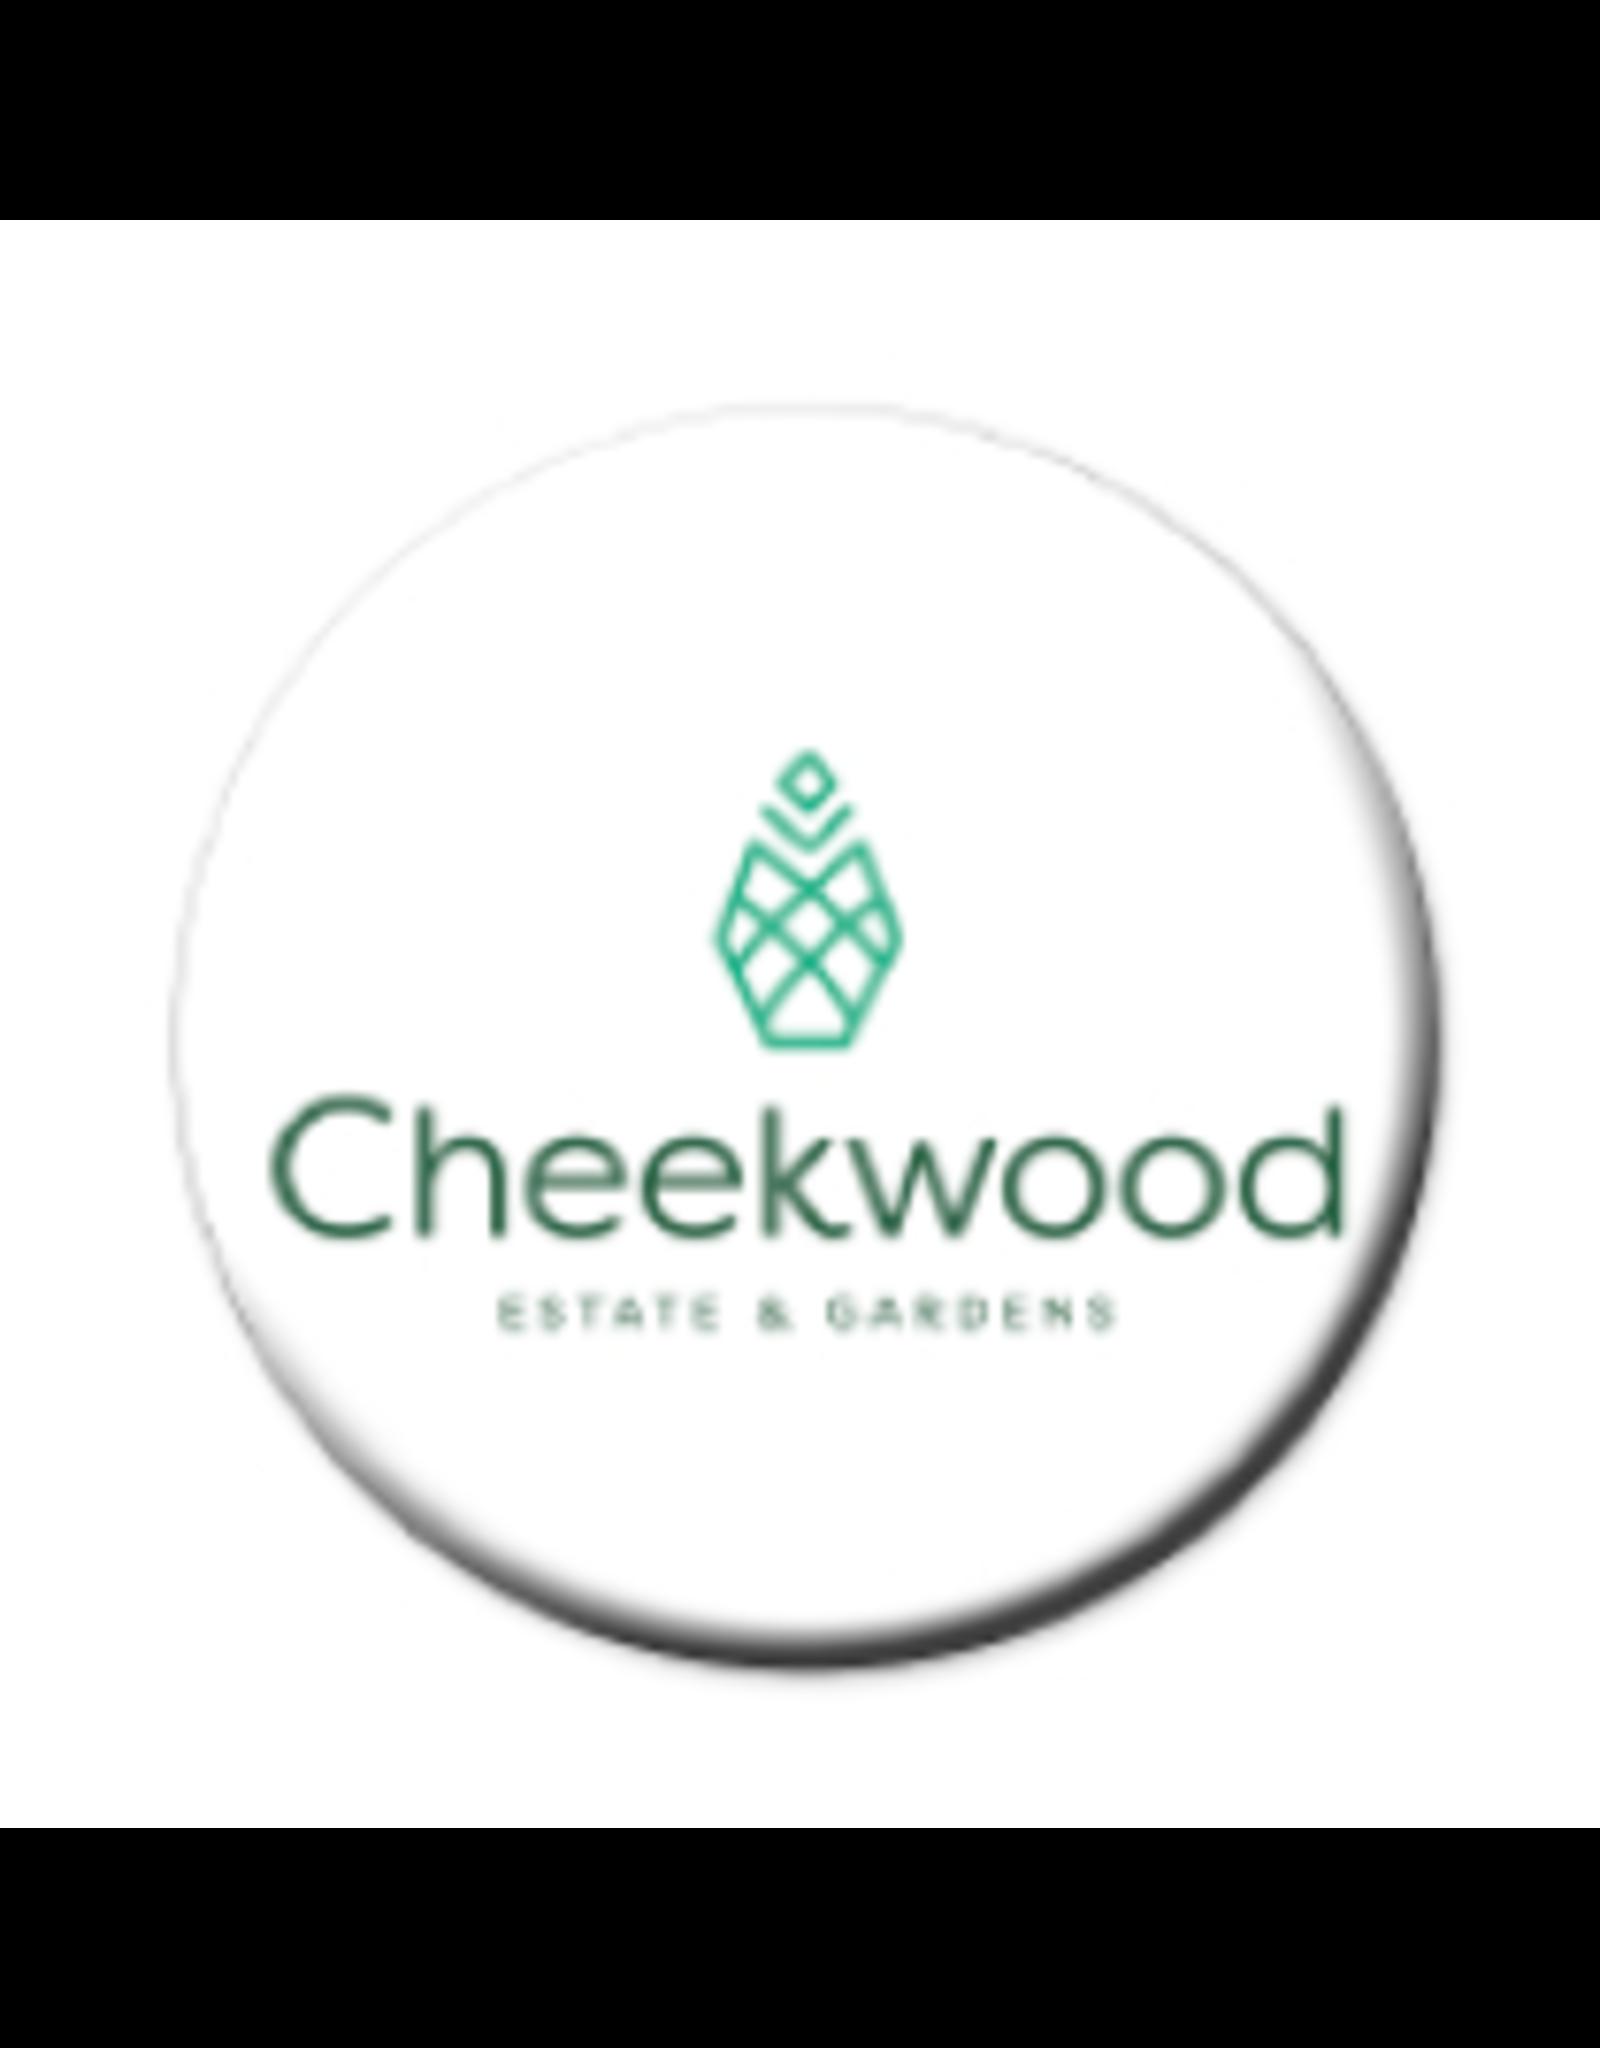 Cheekwood Button/Pin